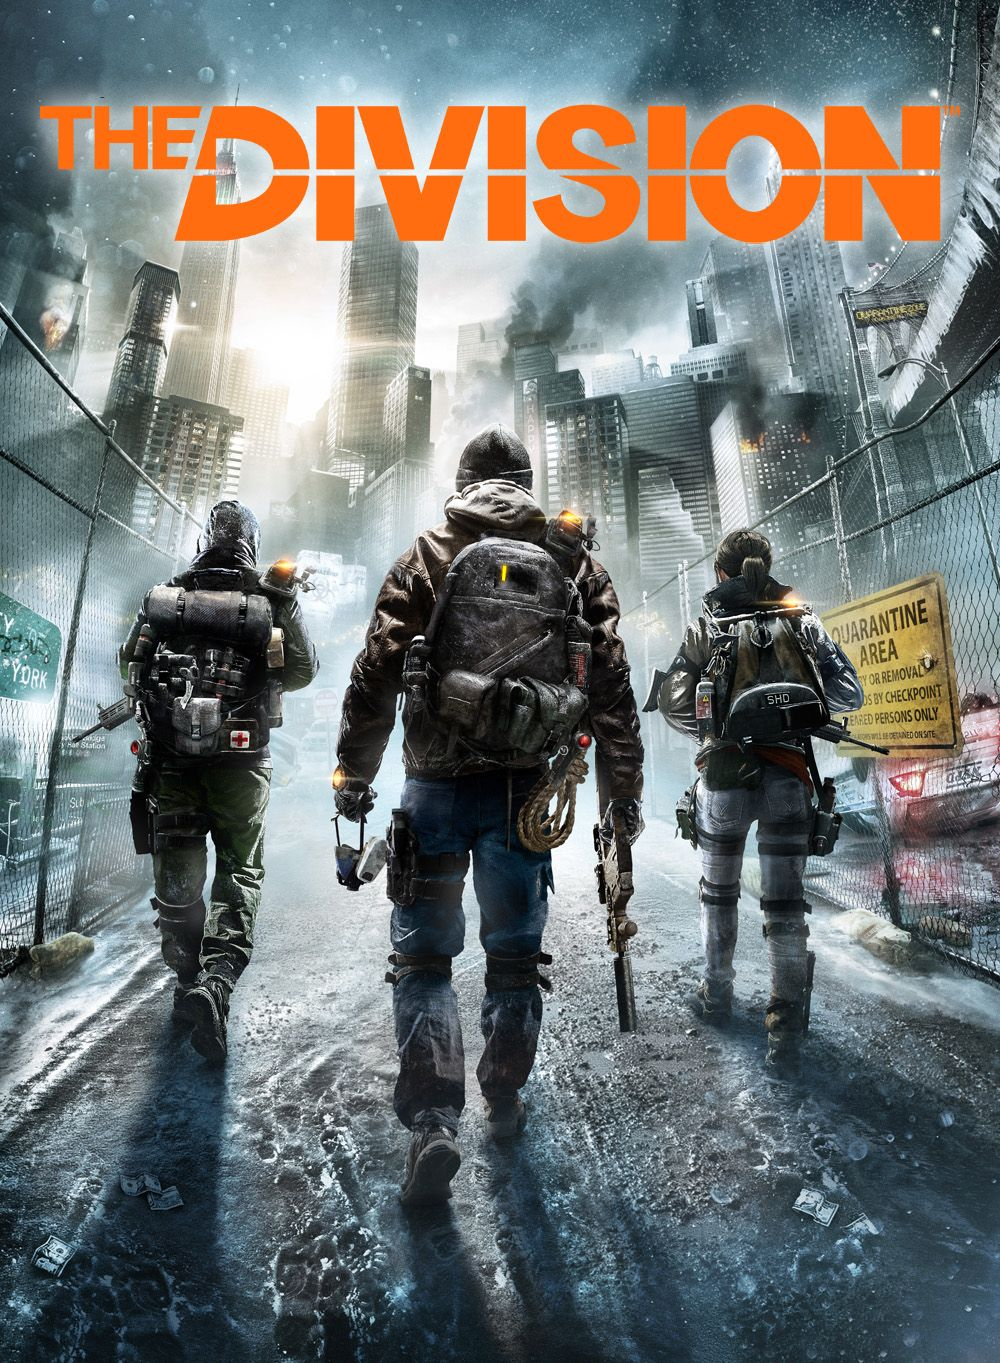 Célèbre The Division (2016) - Jeu vidéo - SensCritique NL41